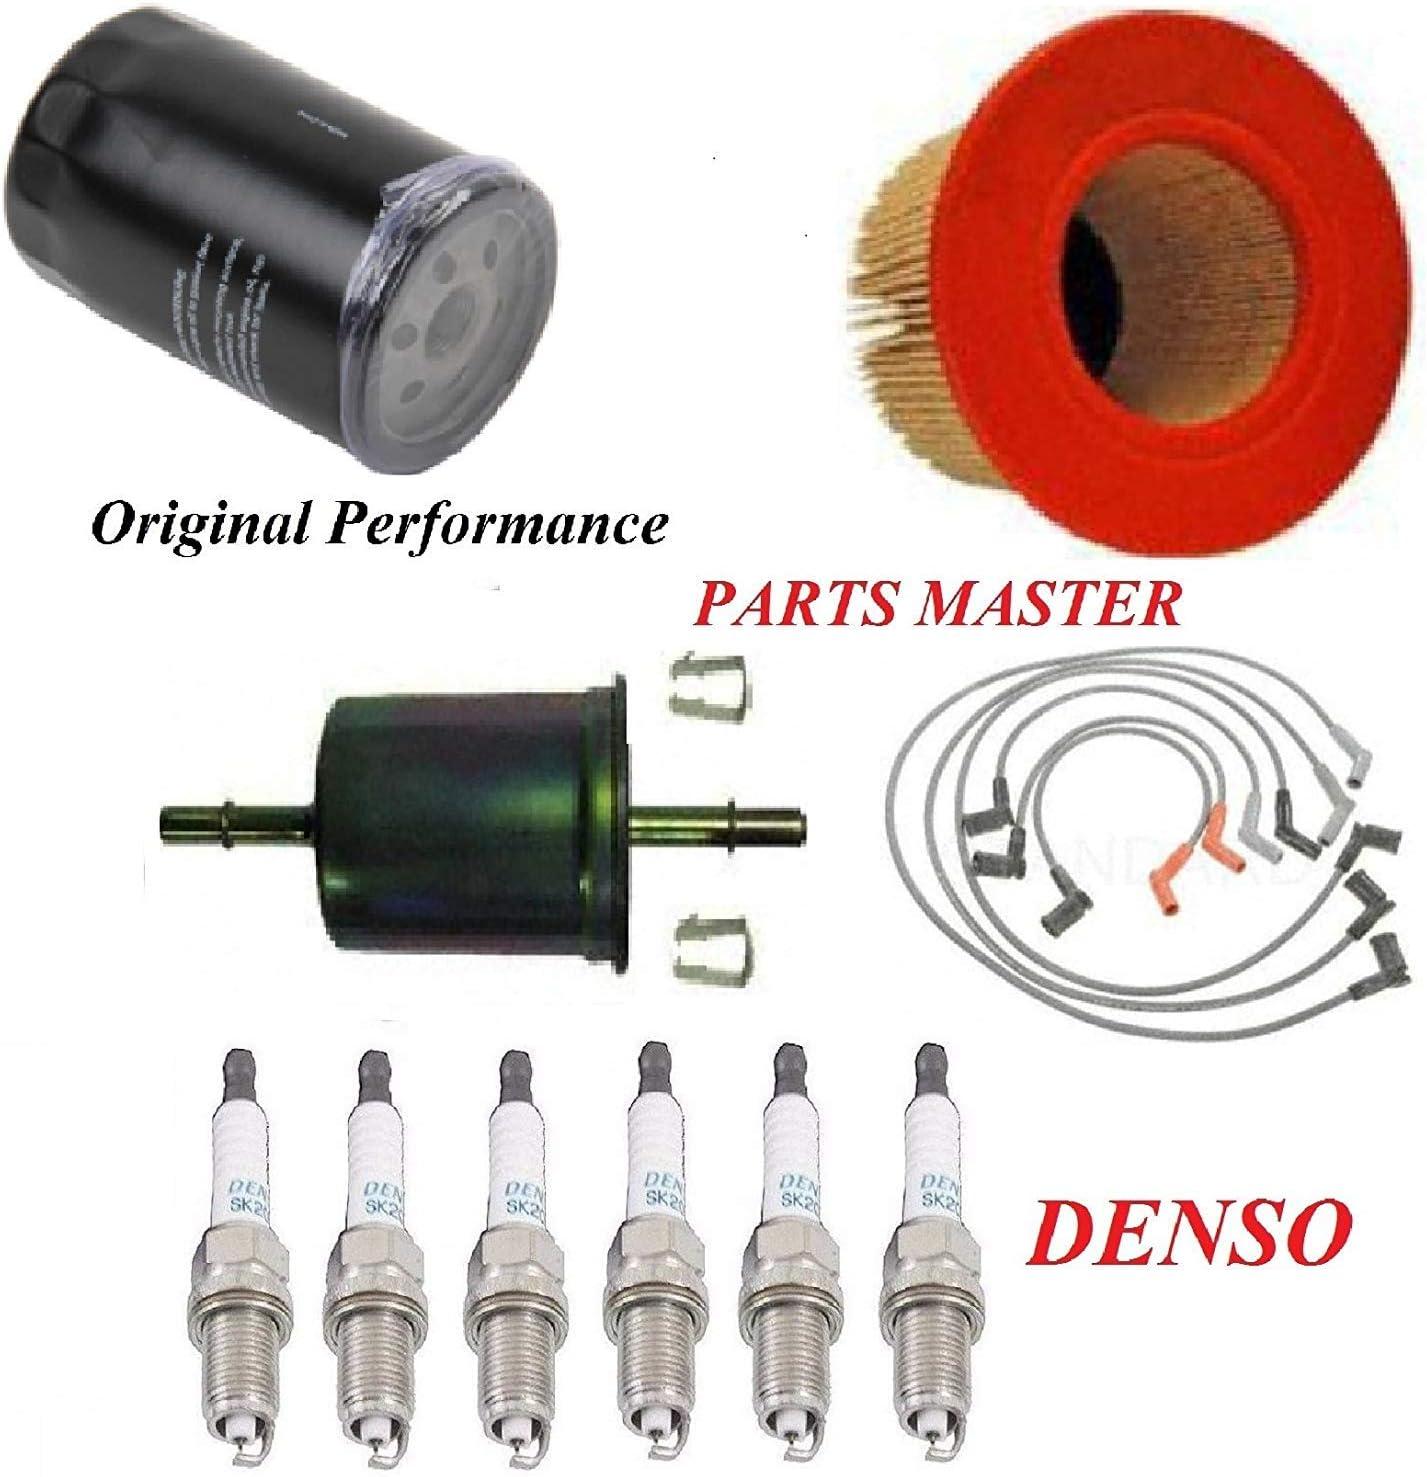 [DIAGRAM_38DE]  Amazon.com: Tune Up Kit Air Oil Fuel Filters Wire Spark Plug FIT FORD F-150  V6 4.2L 2005-2008: Automotive | 2005 F150 Spark Plug Wiring Harness |  | Amazon.com